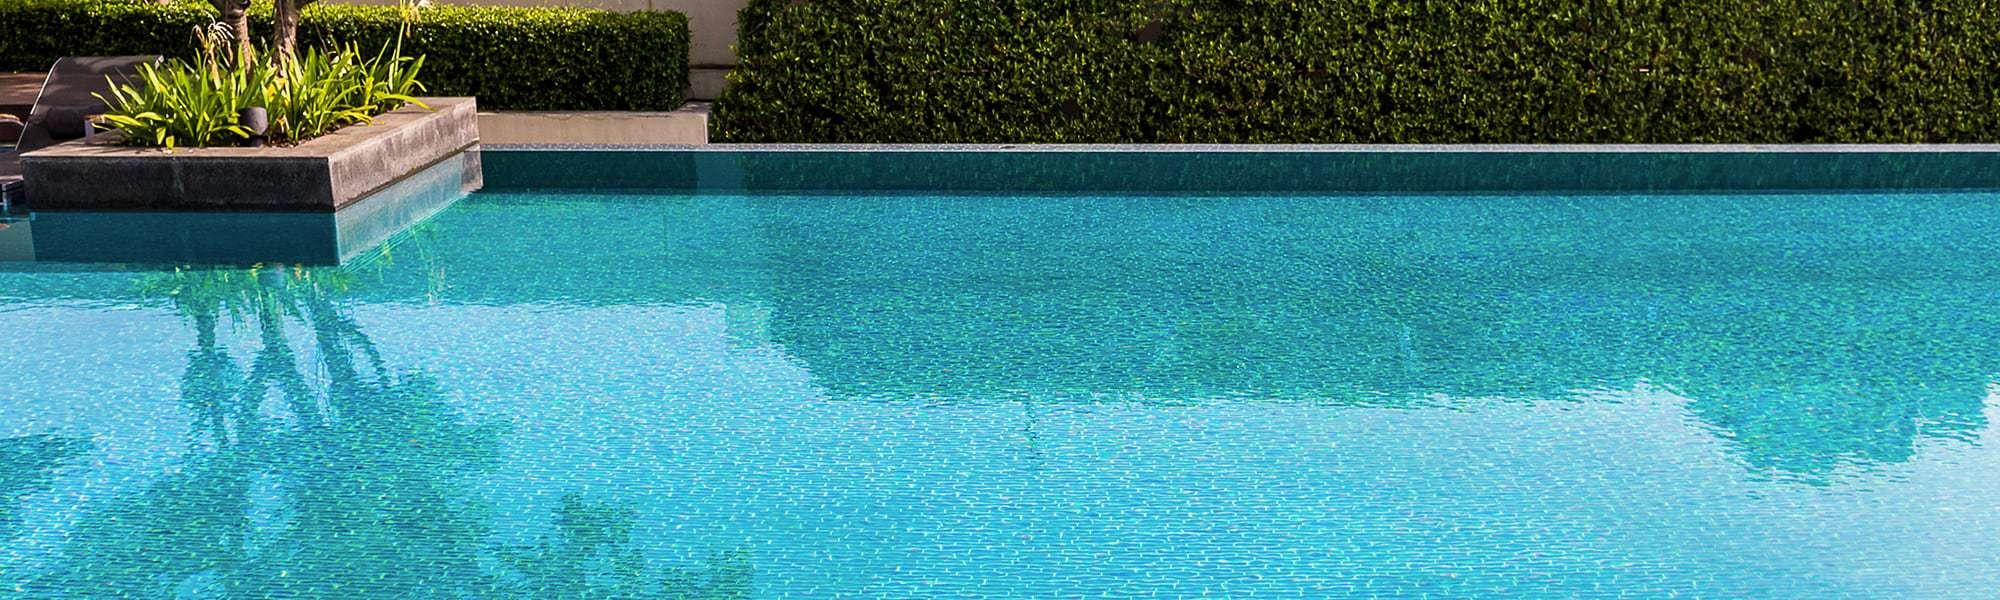 revêtement piscine carrelage